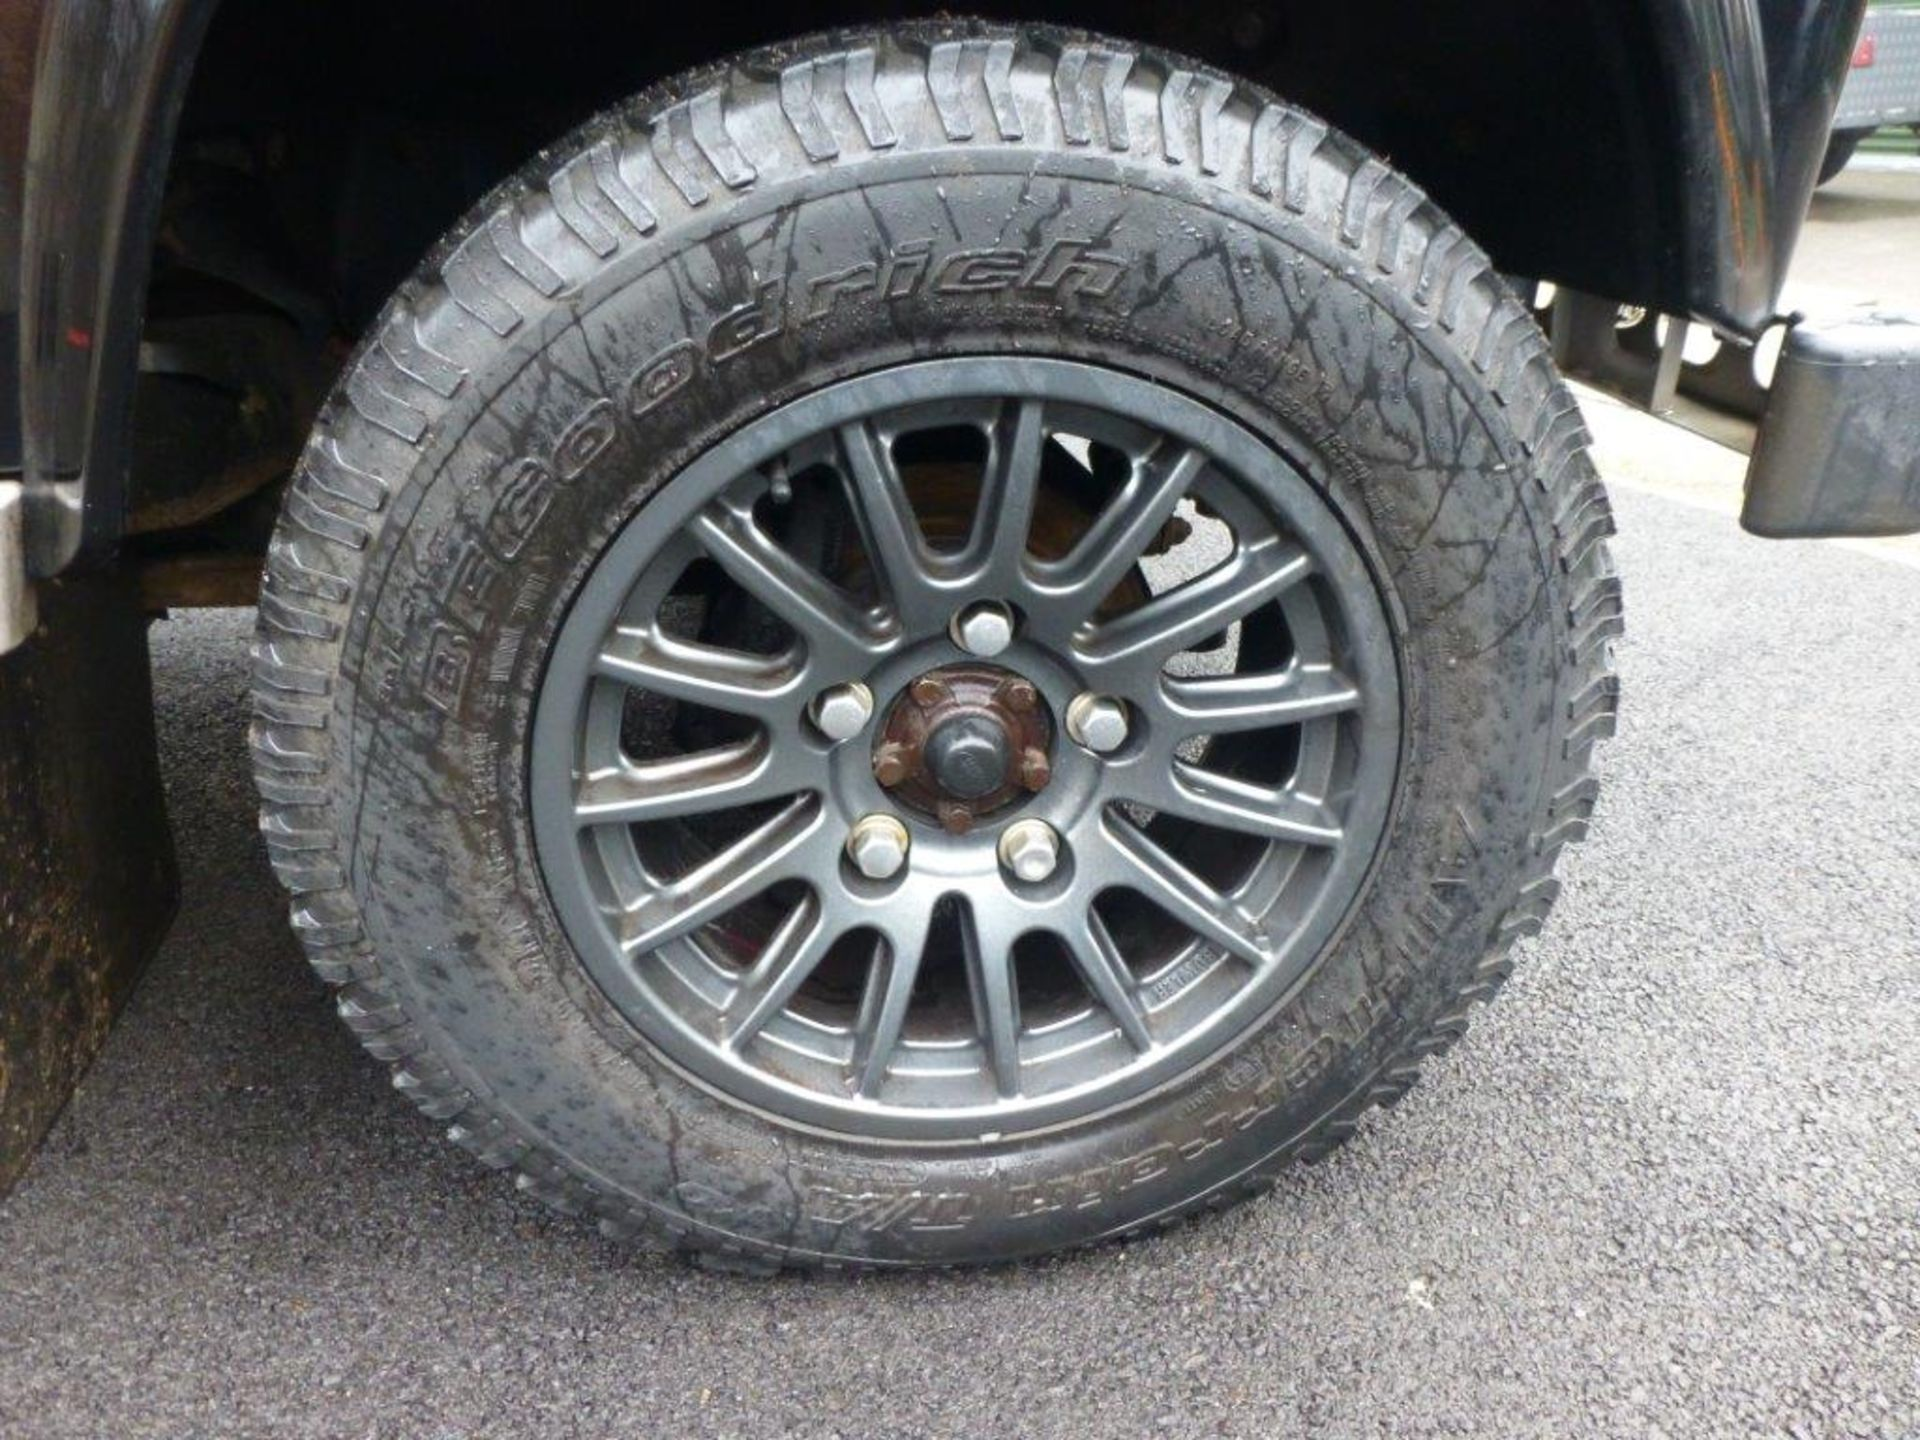 Land Rover Defender 110 XS Bowler double cab pickup TDCi (2.2). Reg no. T9 FNK. Reg. date 23/03/ - Image 8 of 13